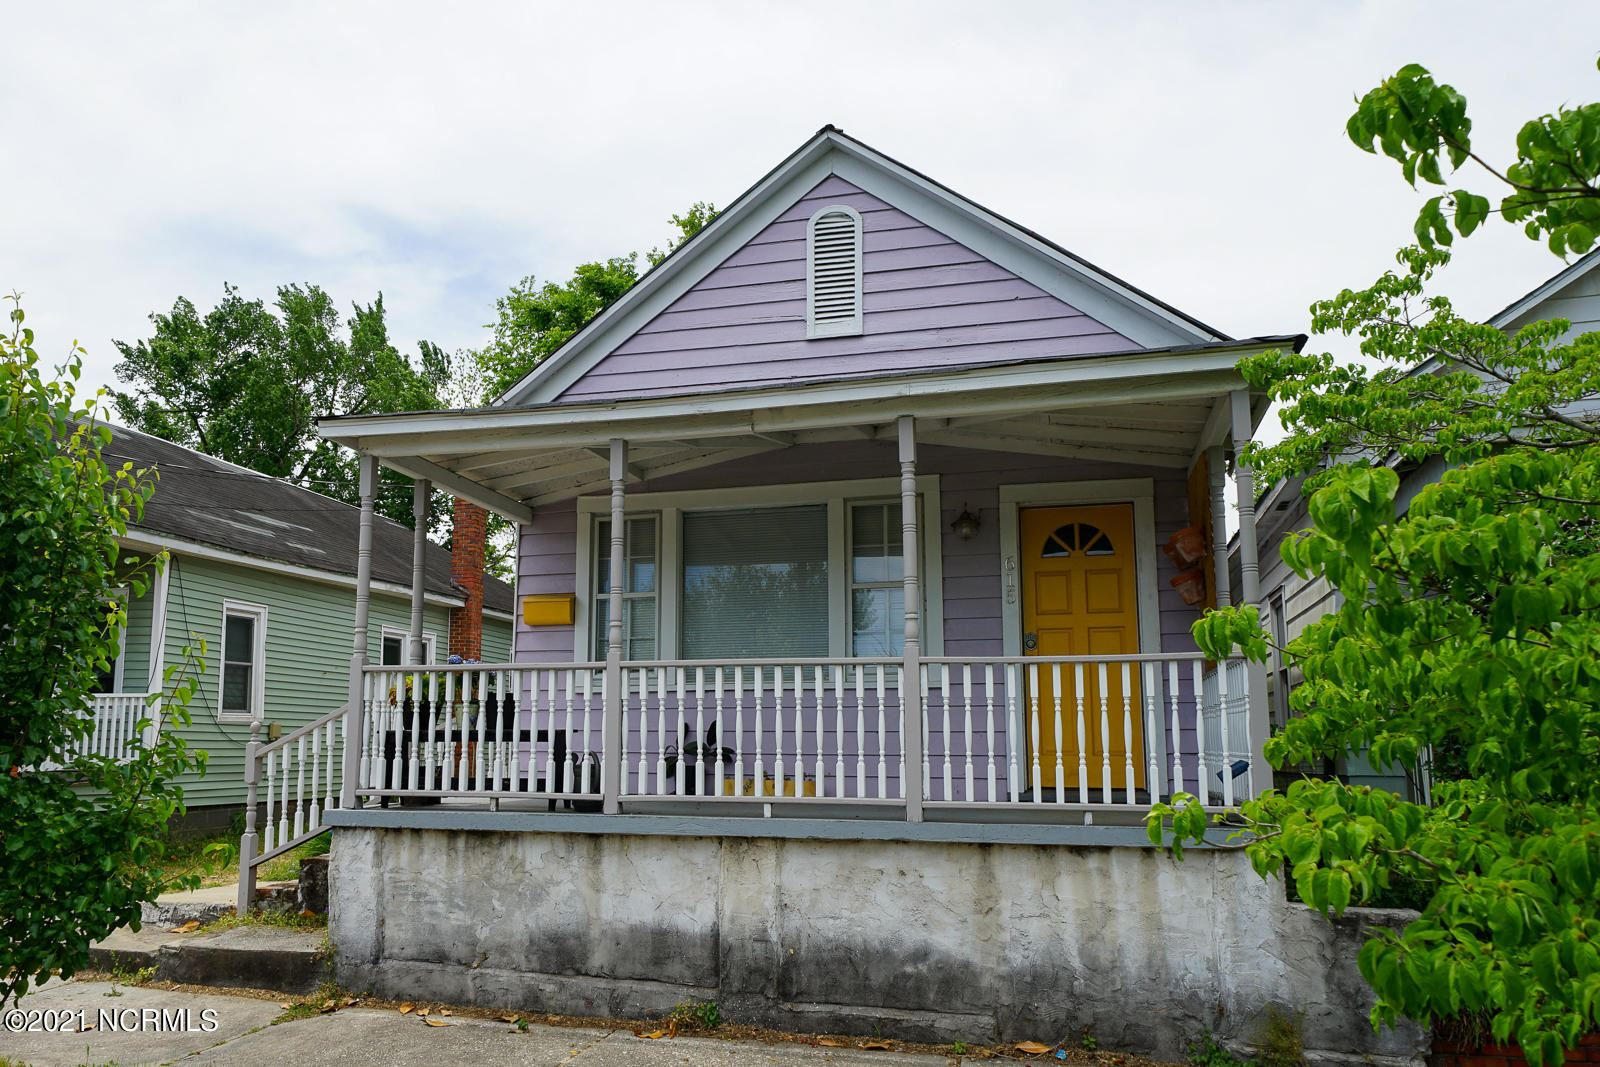 Photo for 615 N 10th Street, Wilmington, NC 28401 (MLS # 100266319)